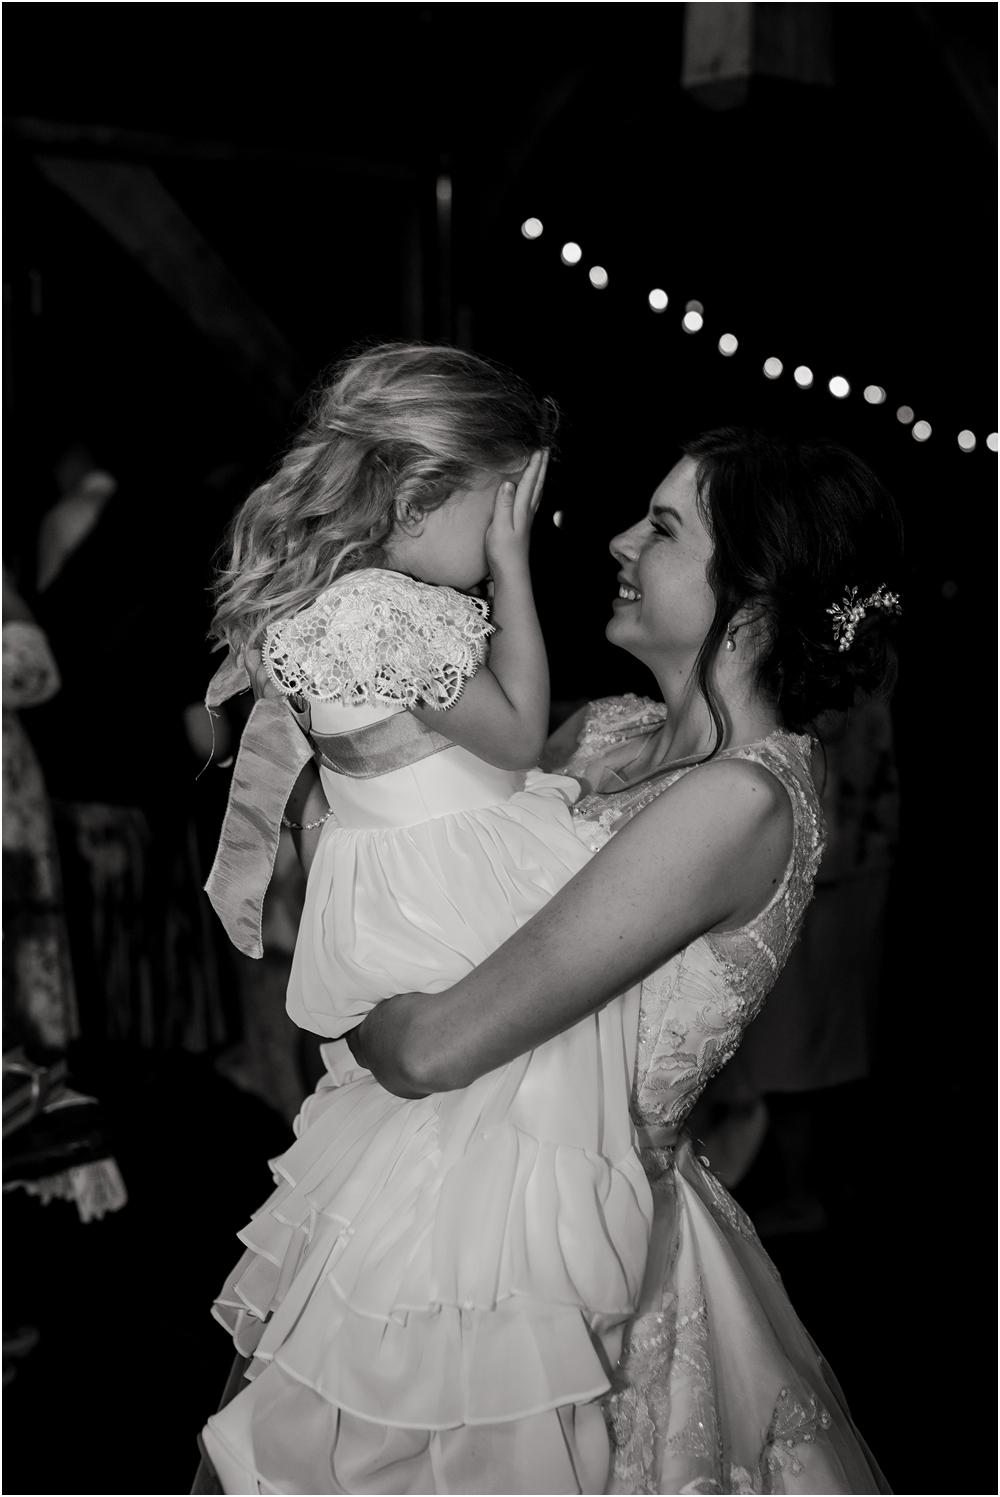 marianna-florida-wedding-photographer-kiersten-grant-210.jpg